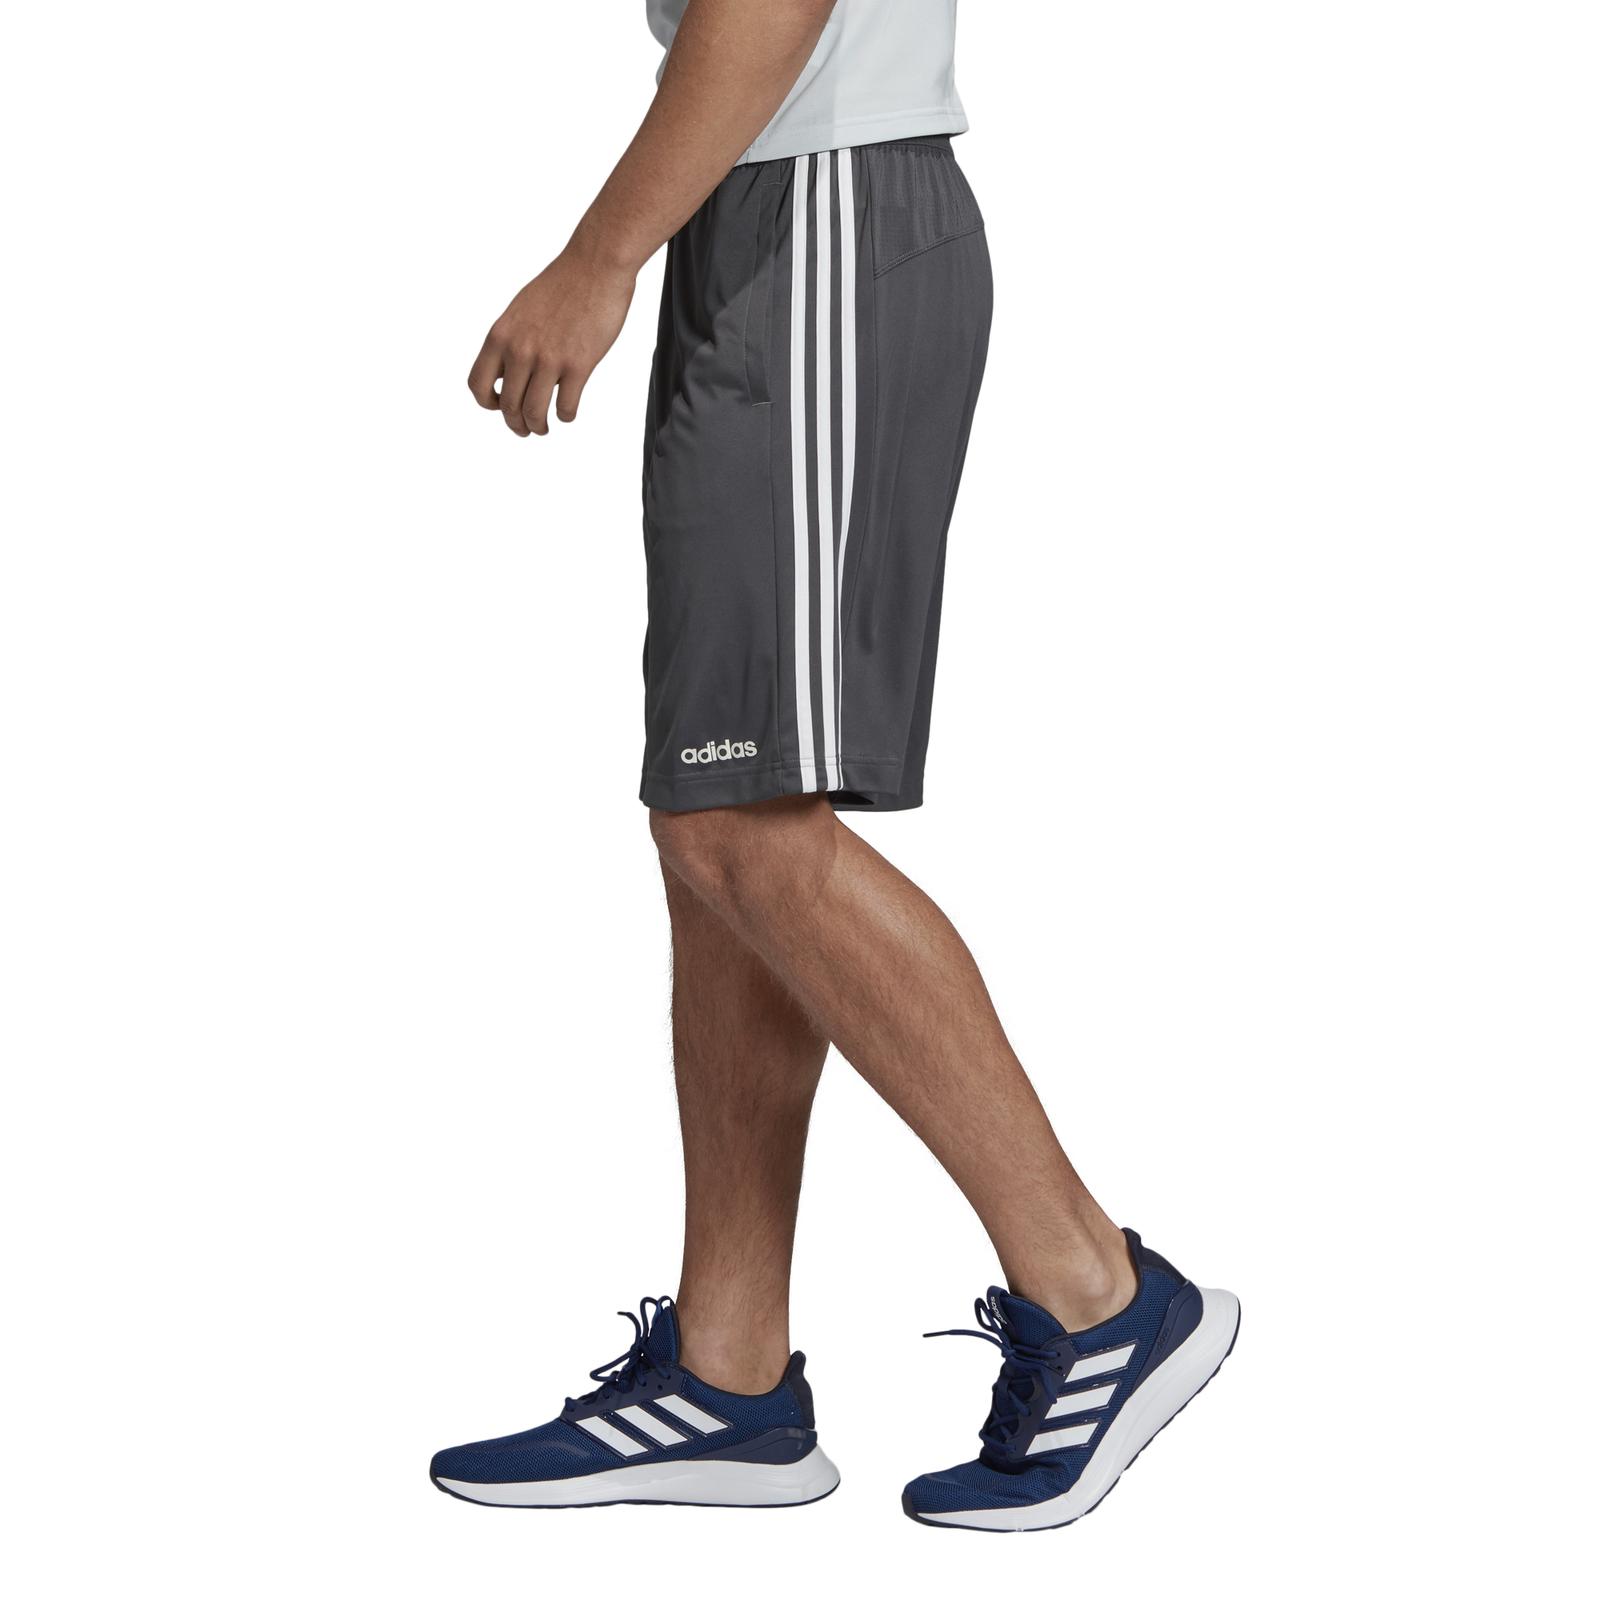 adidas Design 2 Move Climacool 3 Streifen Trainingshose kurz